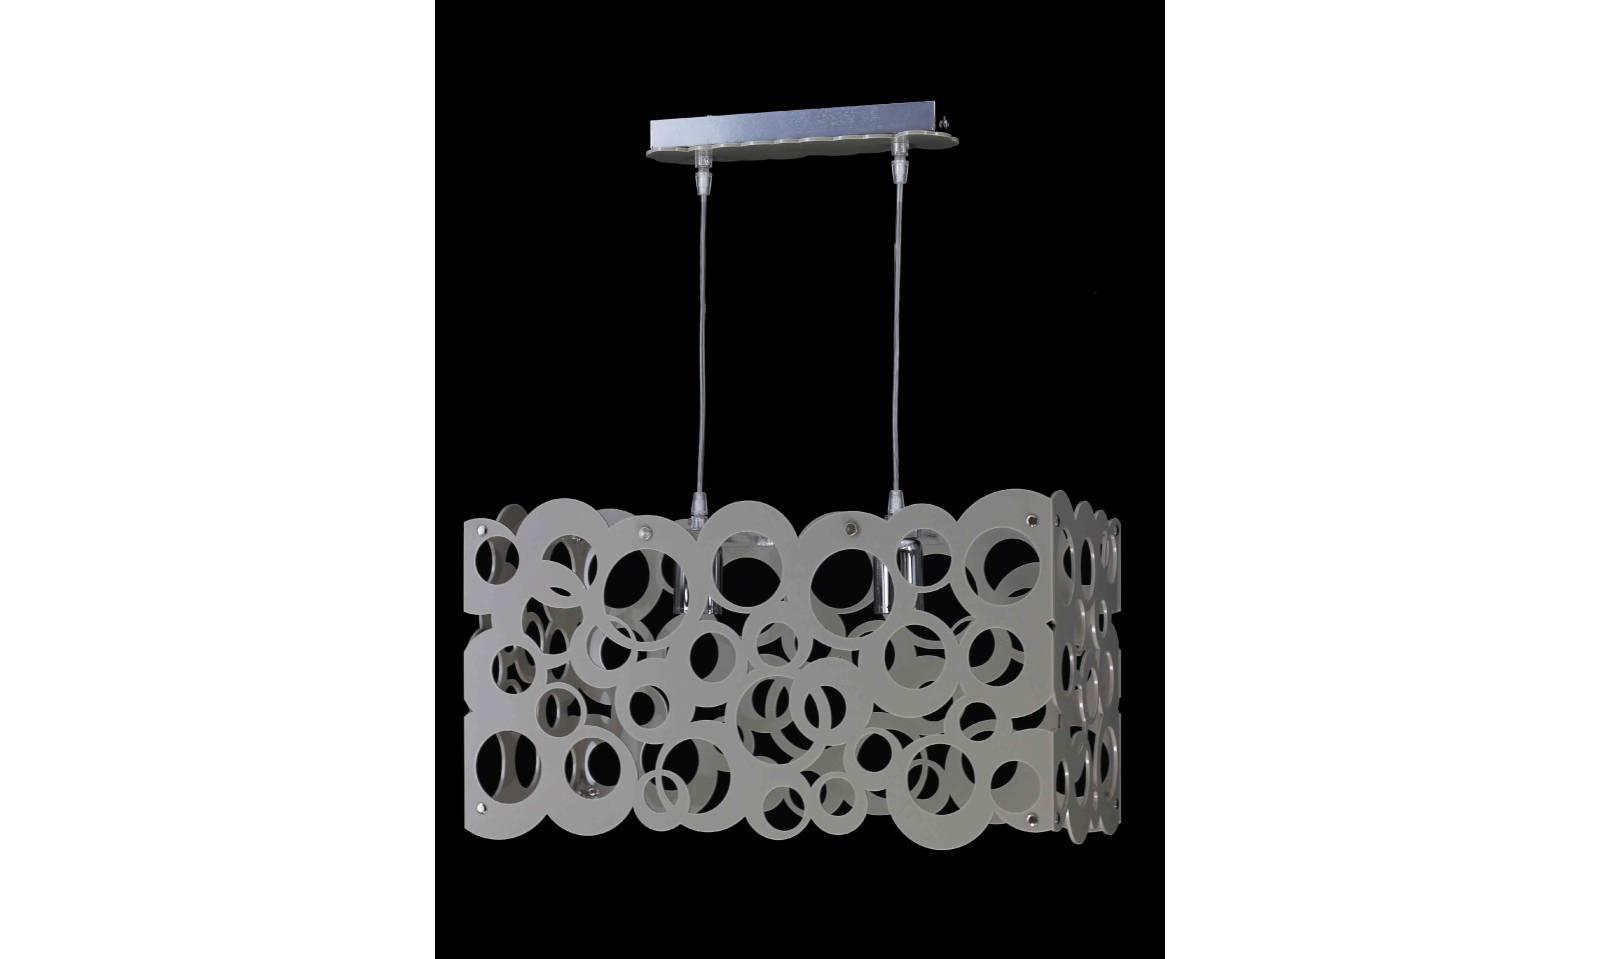 Lampadari Di Carta On Line : Lampadari in plexiglass sospensione rettangolare